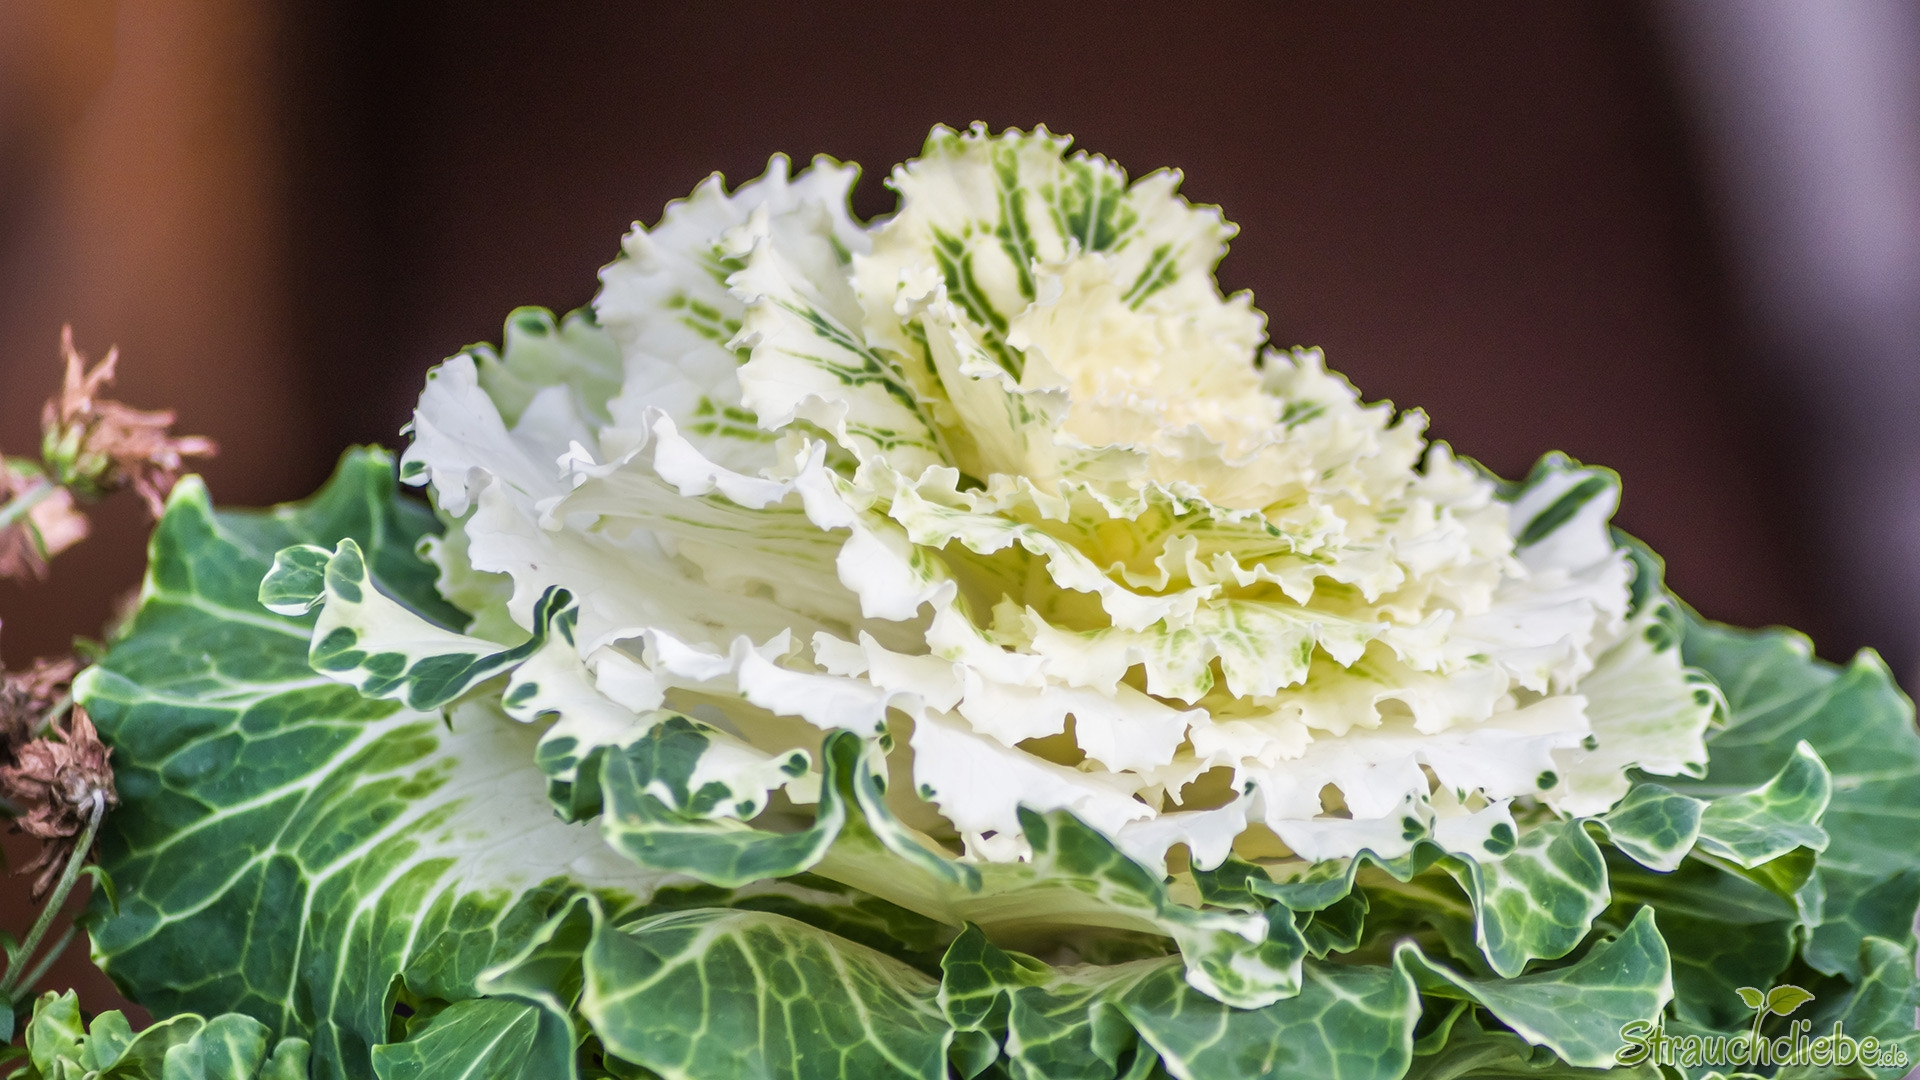 Weißer Zierkohl (Brassica oleracea var. acephala)